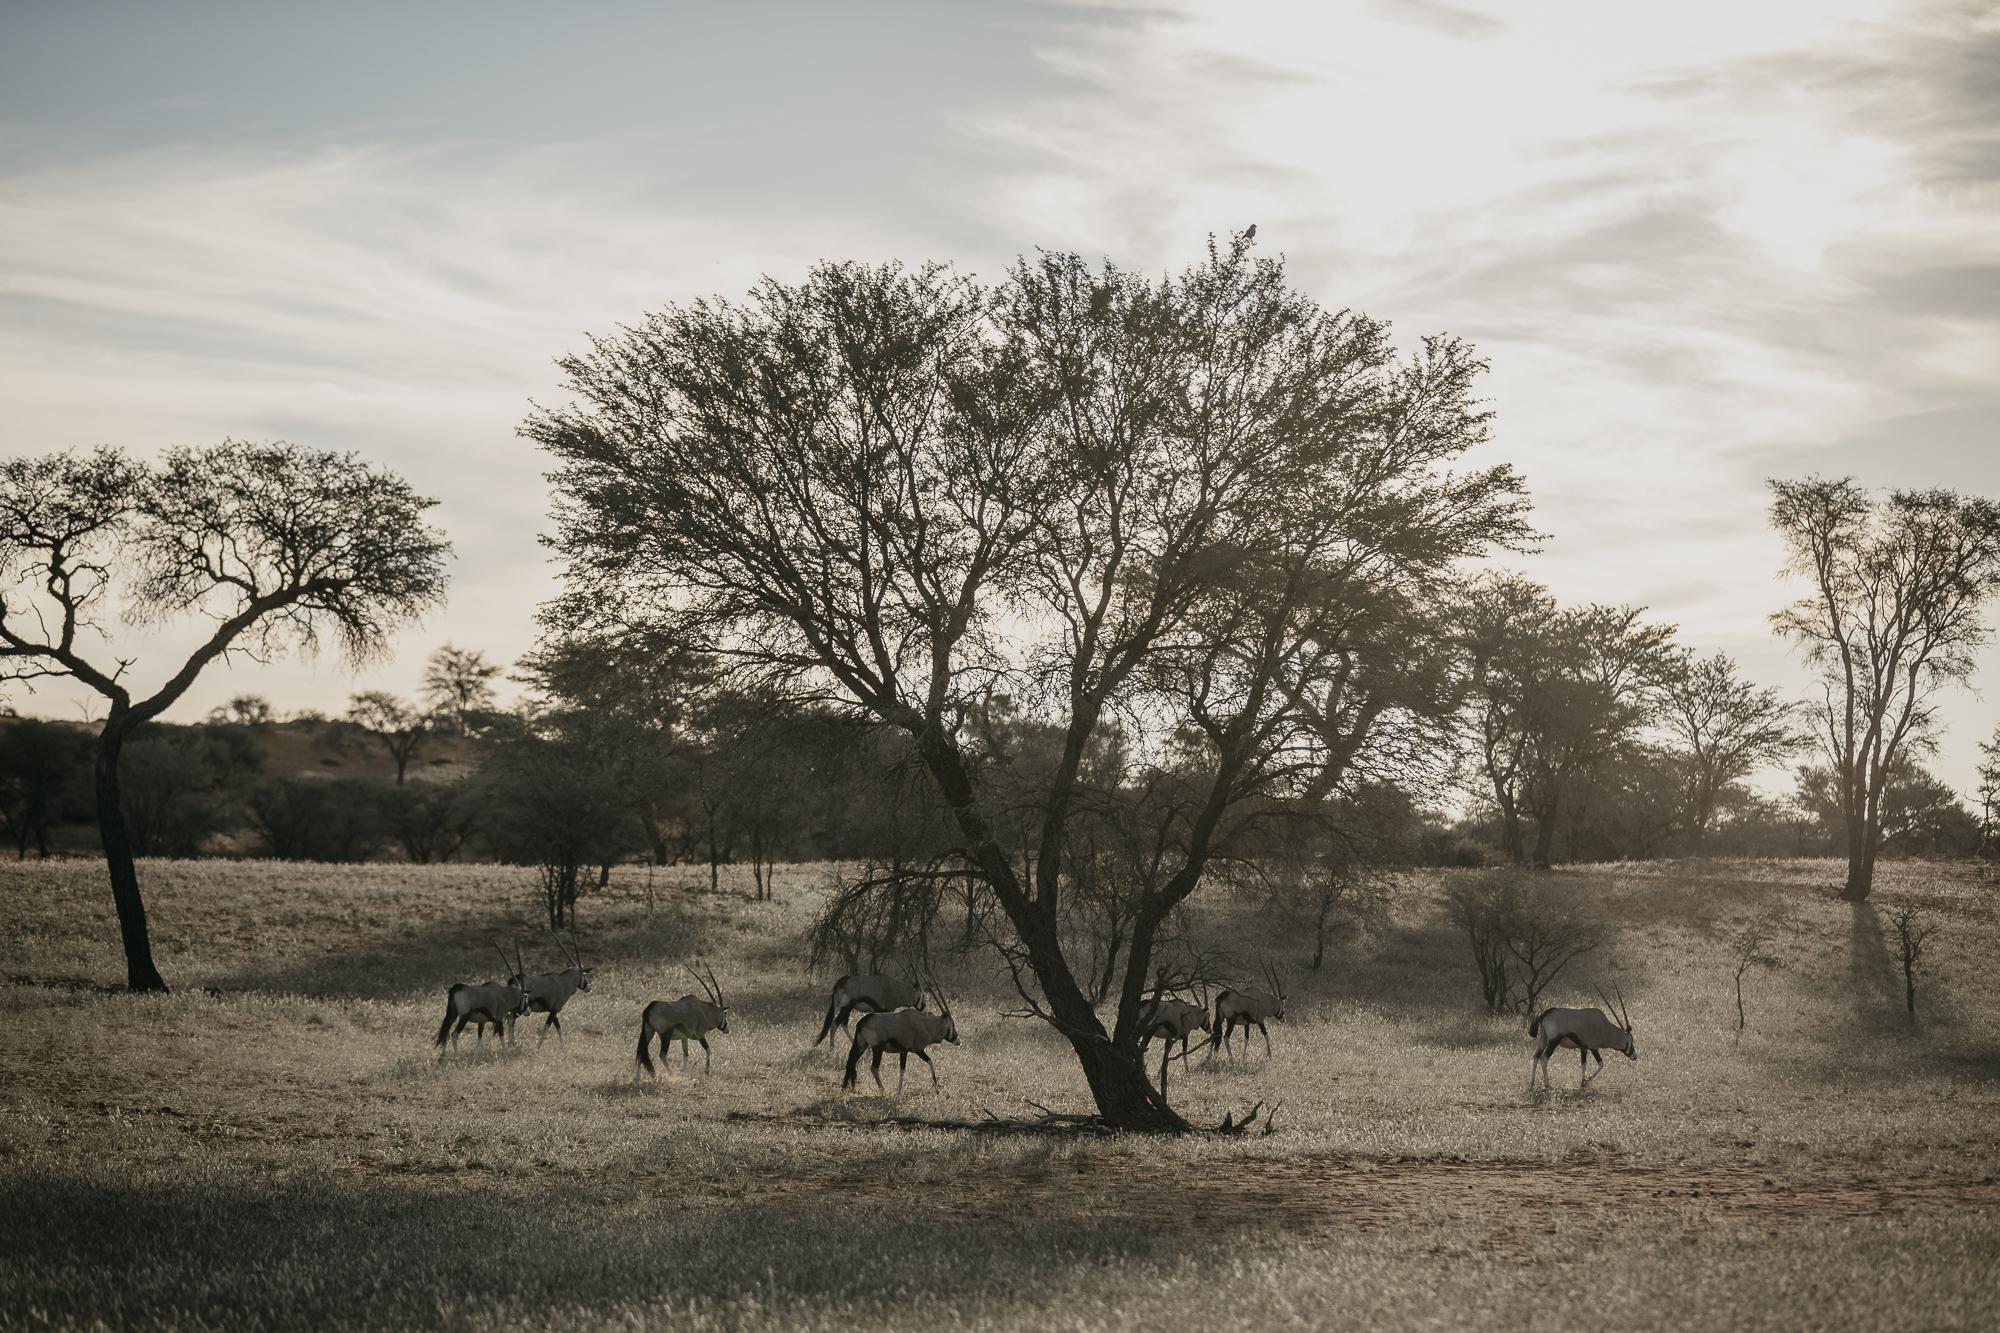 061518_Namibia_PIXd2camF_00158.jpg